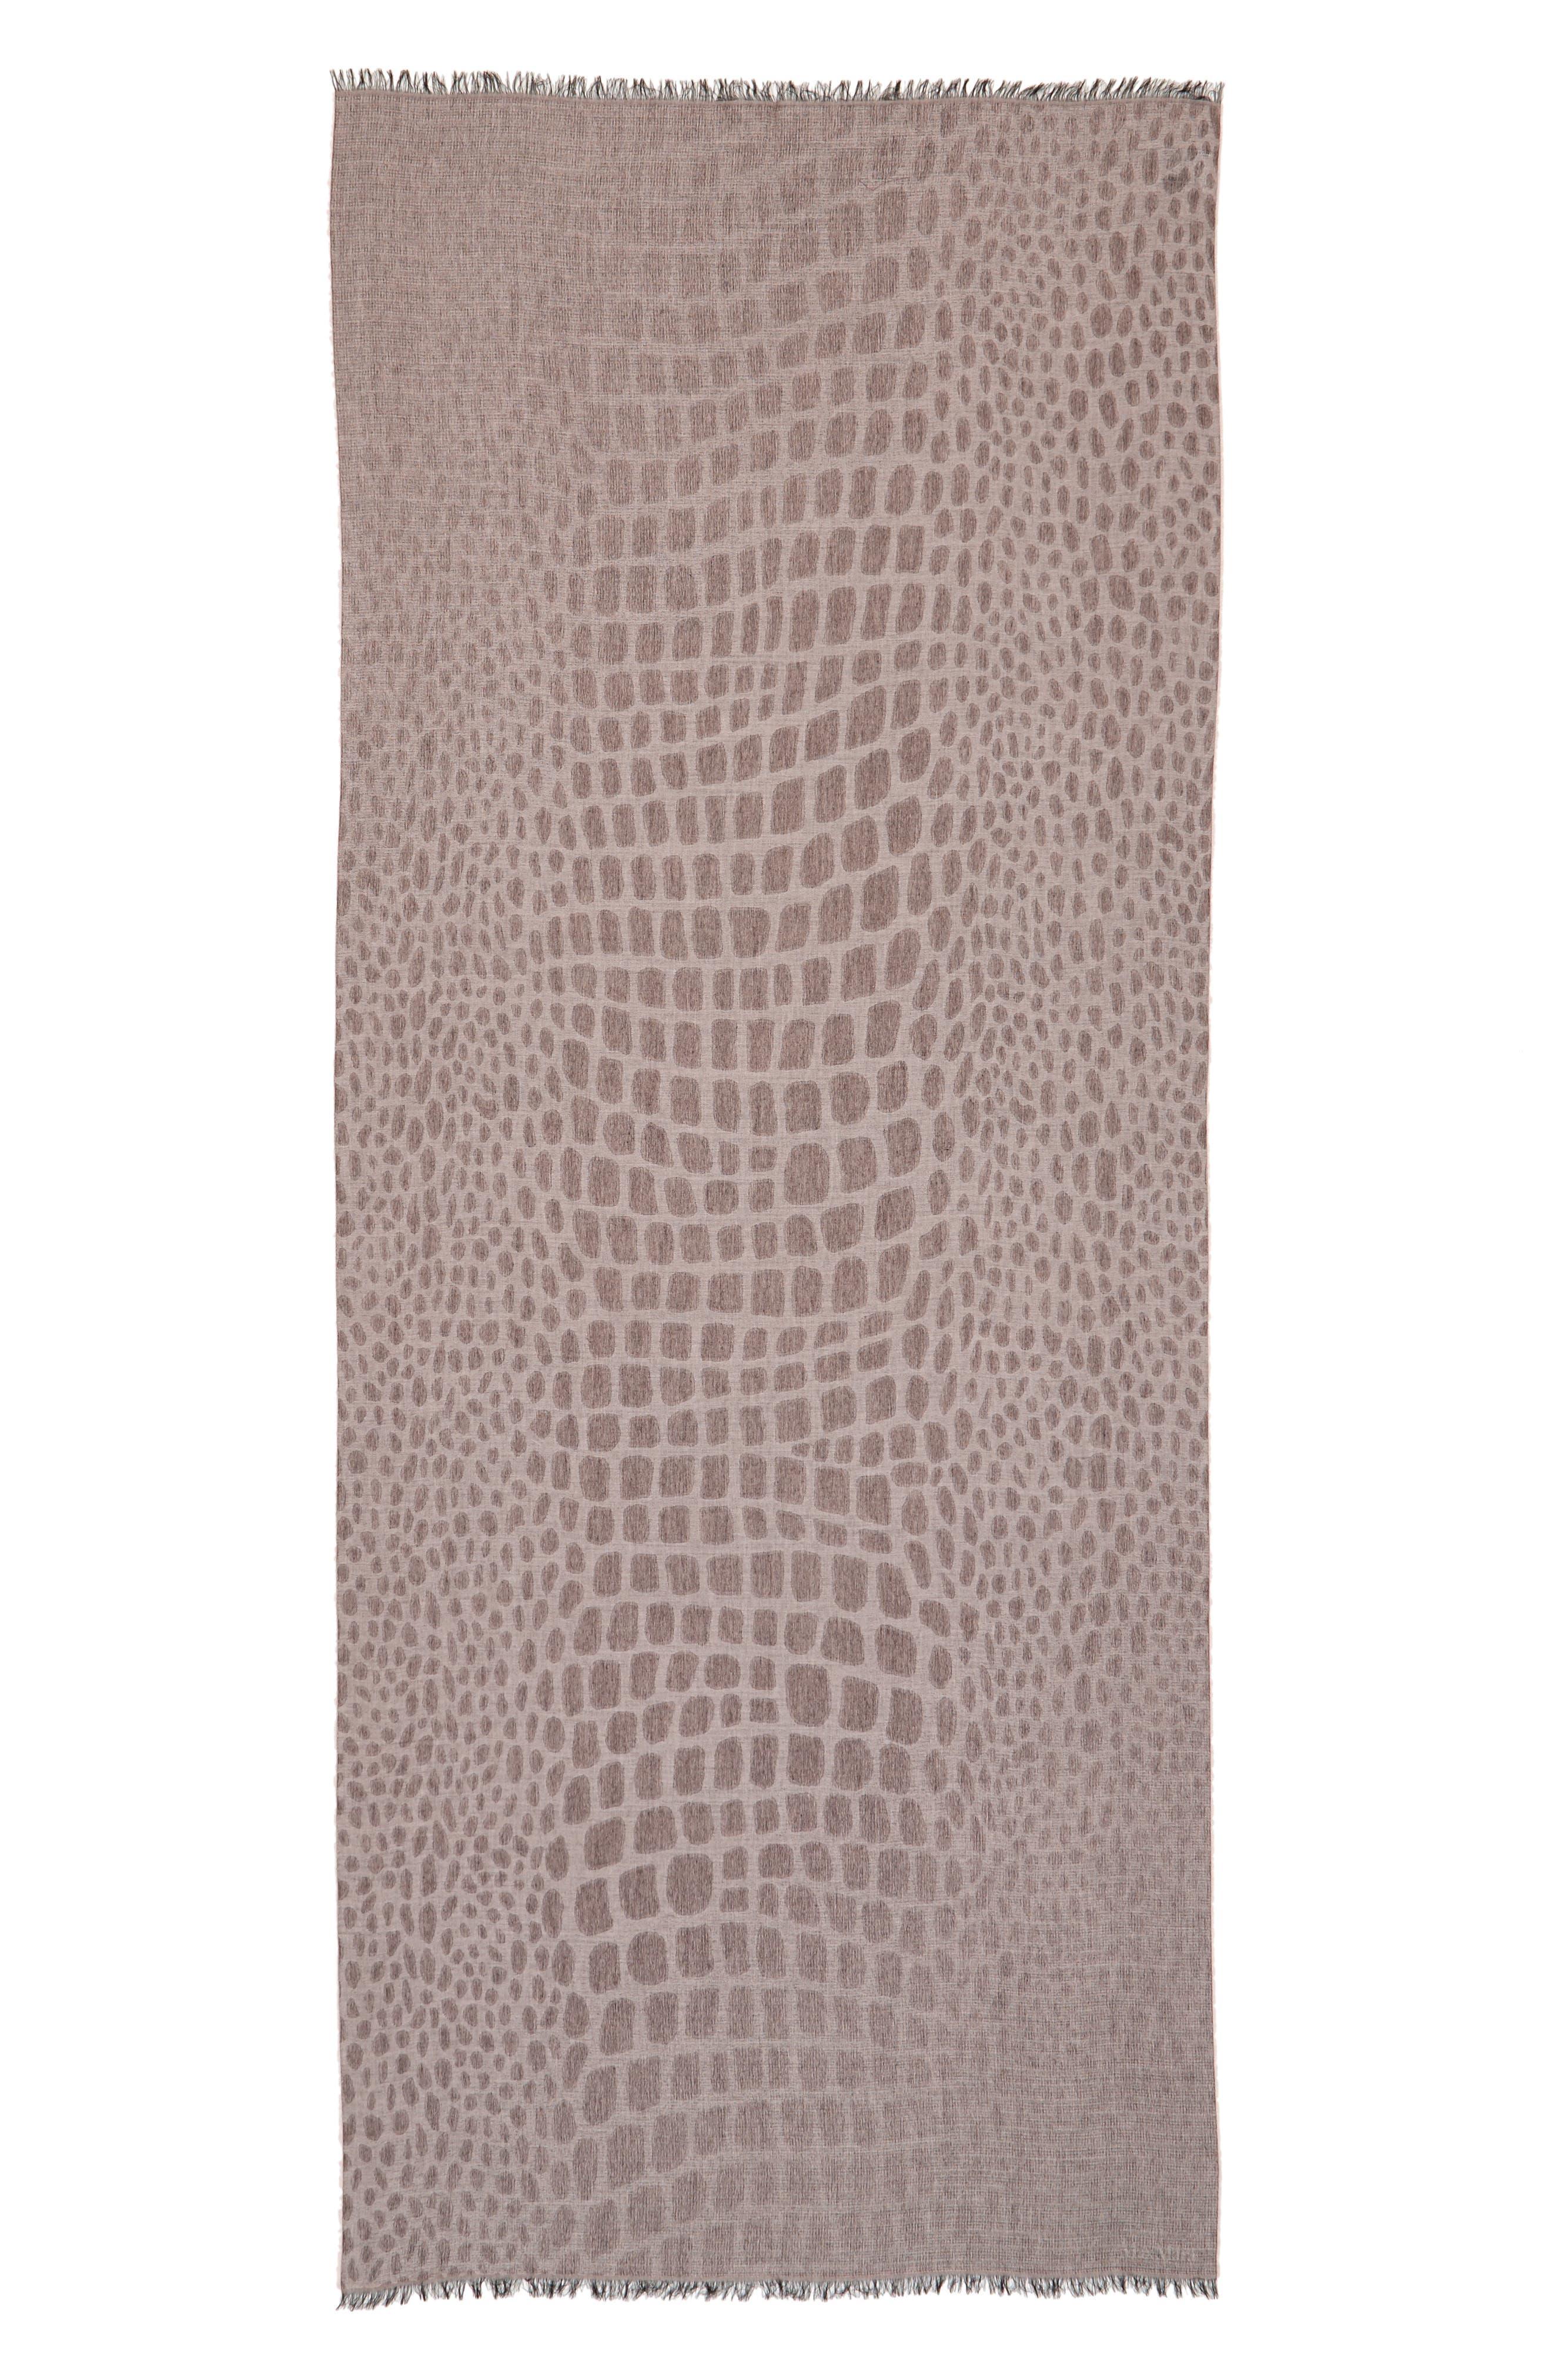 Max Mara Crocodile Print Wool & Modal Scarf